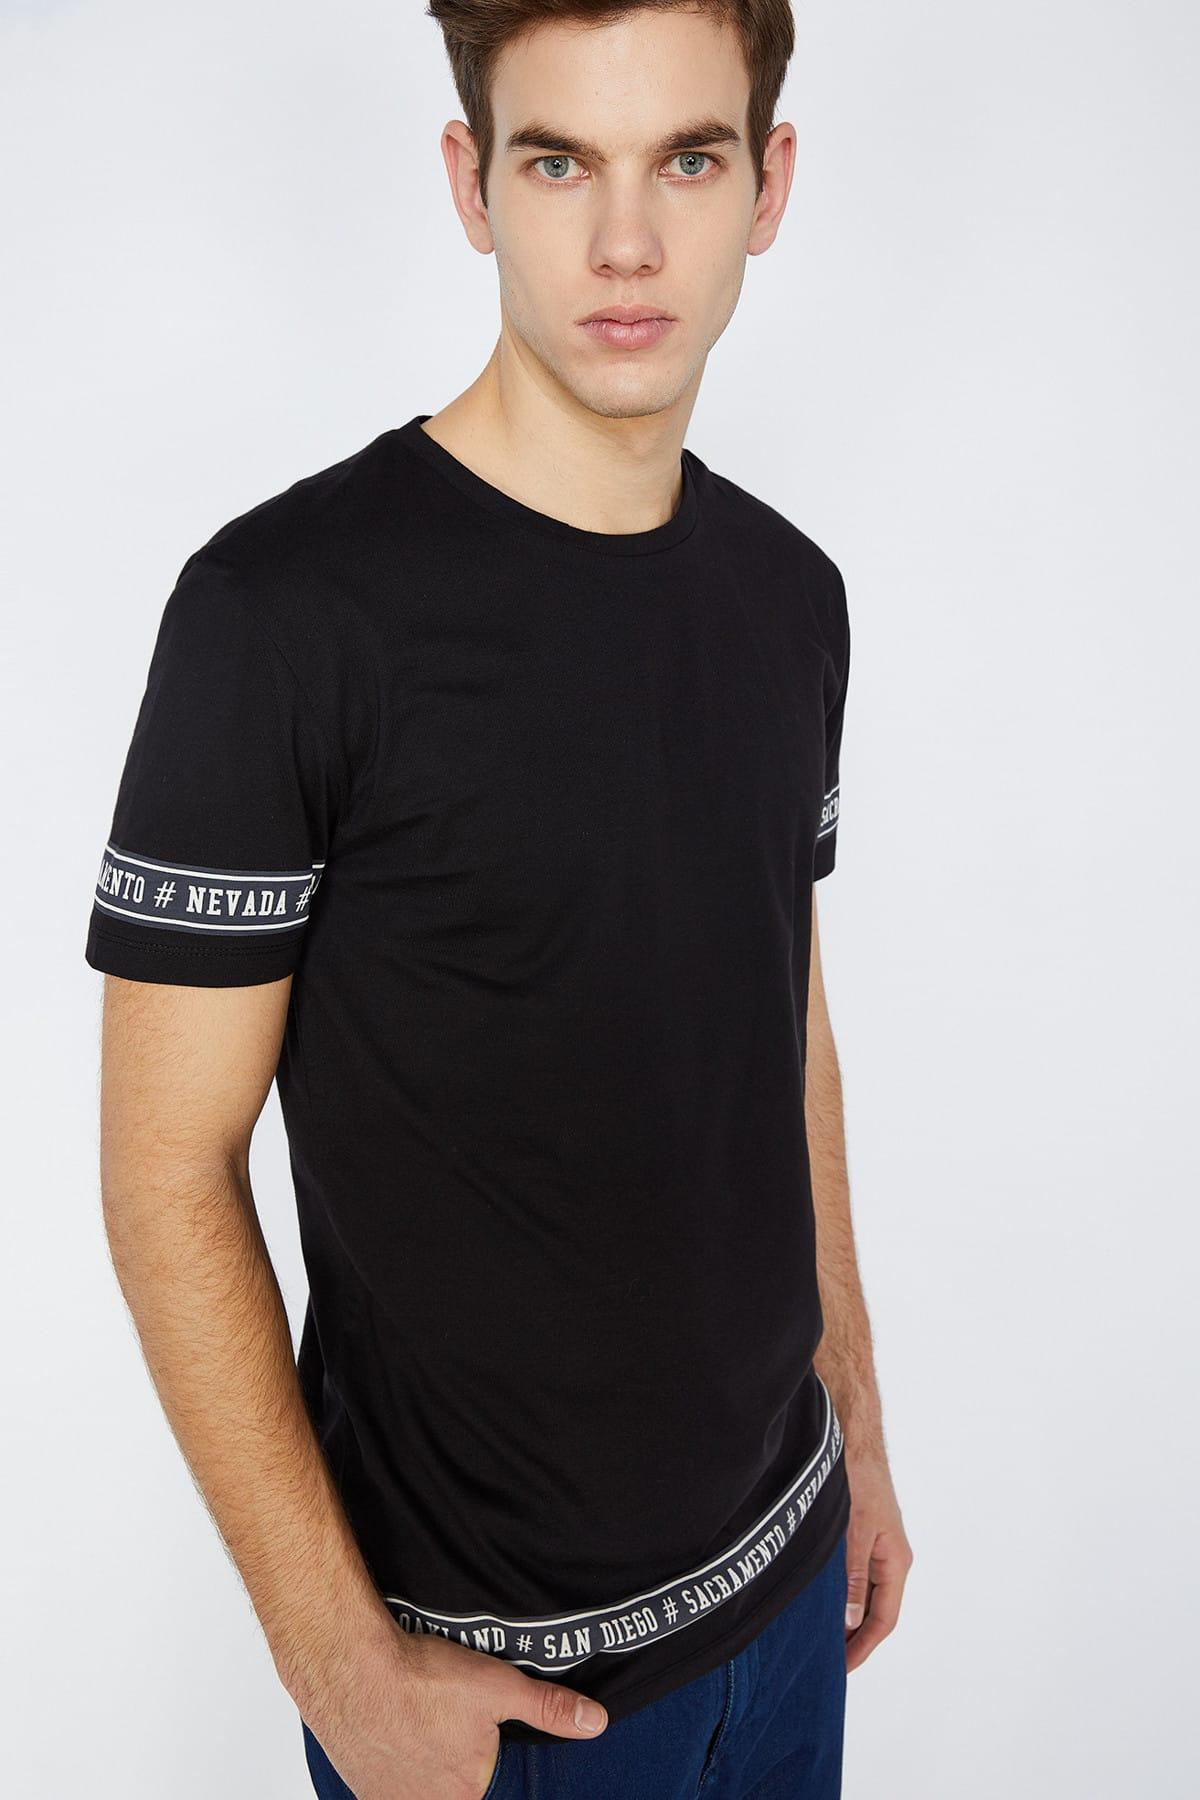 Camiseta preta de koton masculino 9 yam14104ok